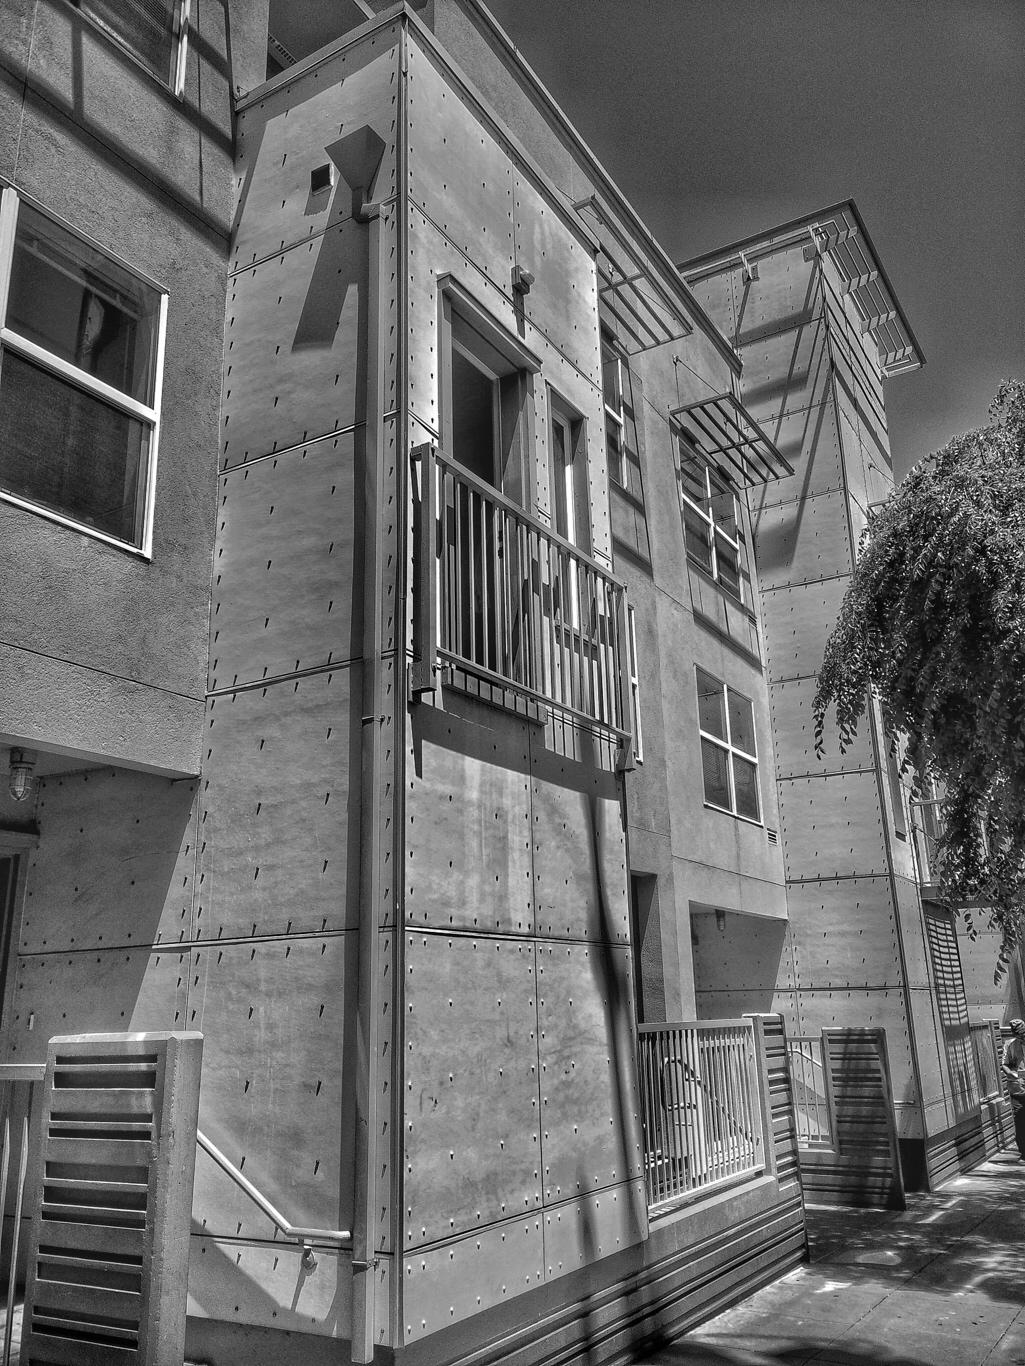 Housing project, Mission Distri - voiceofsf   ello